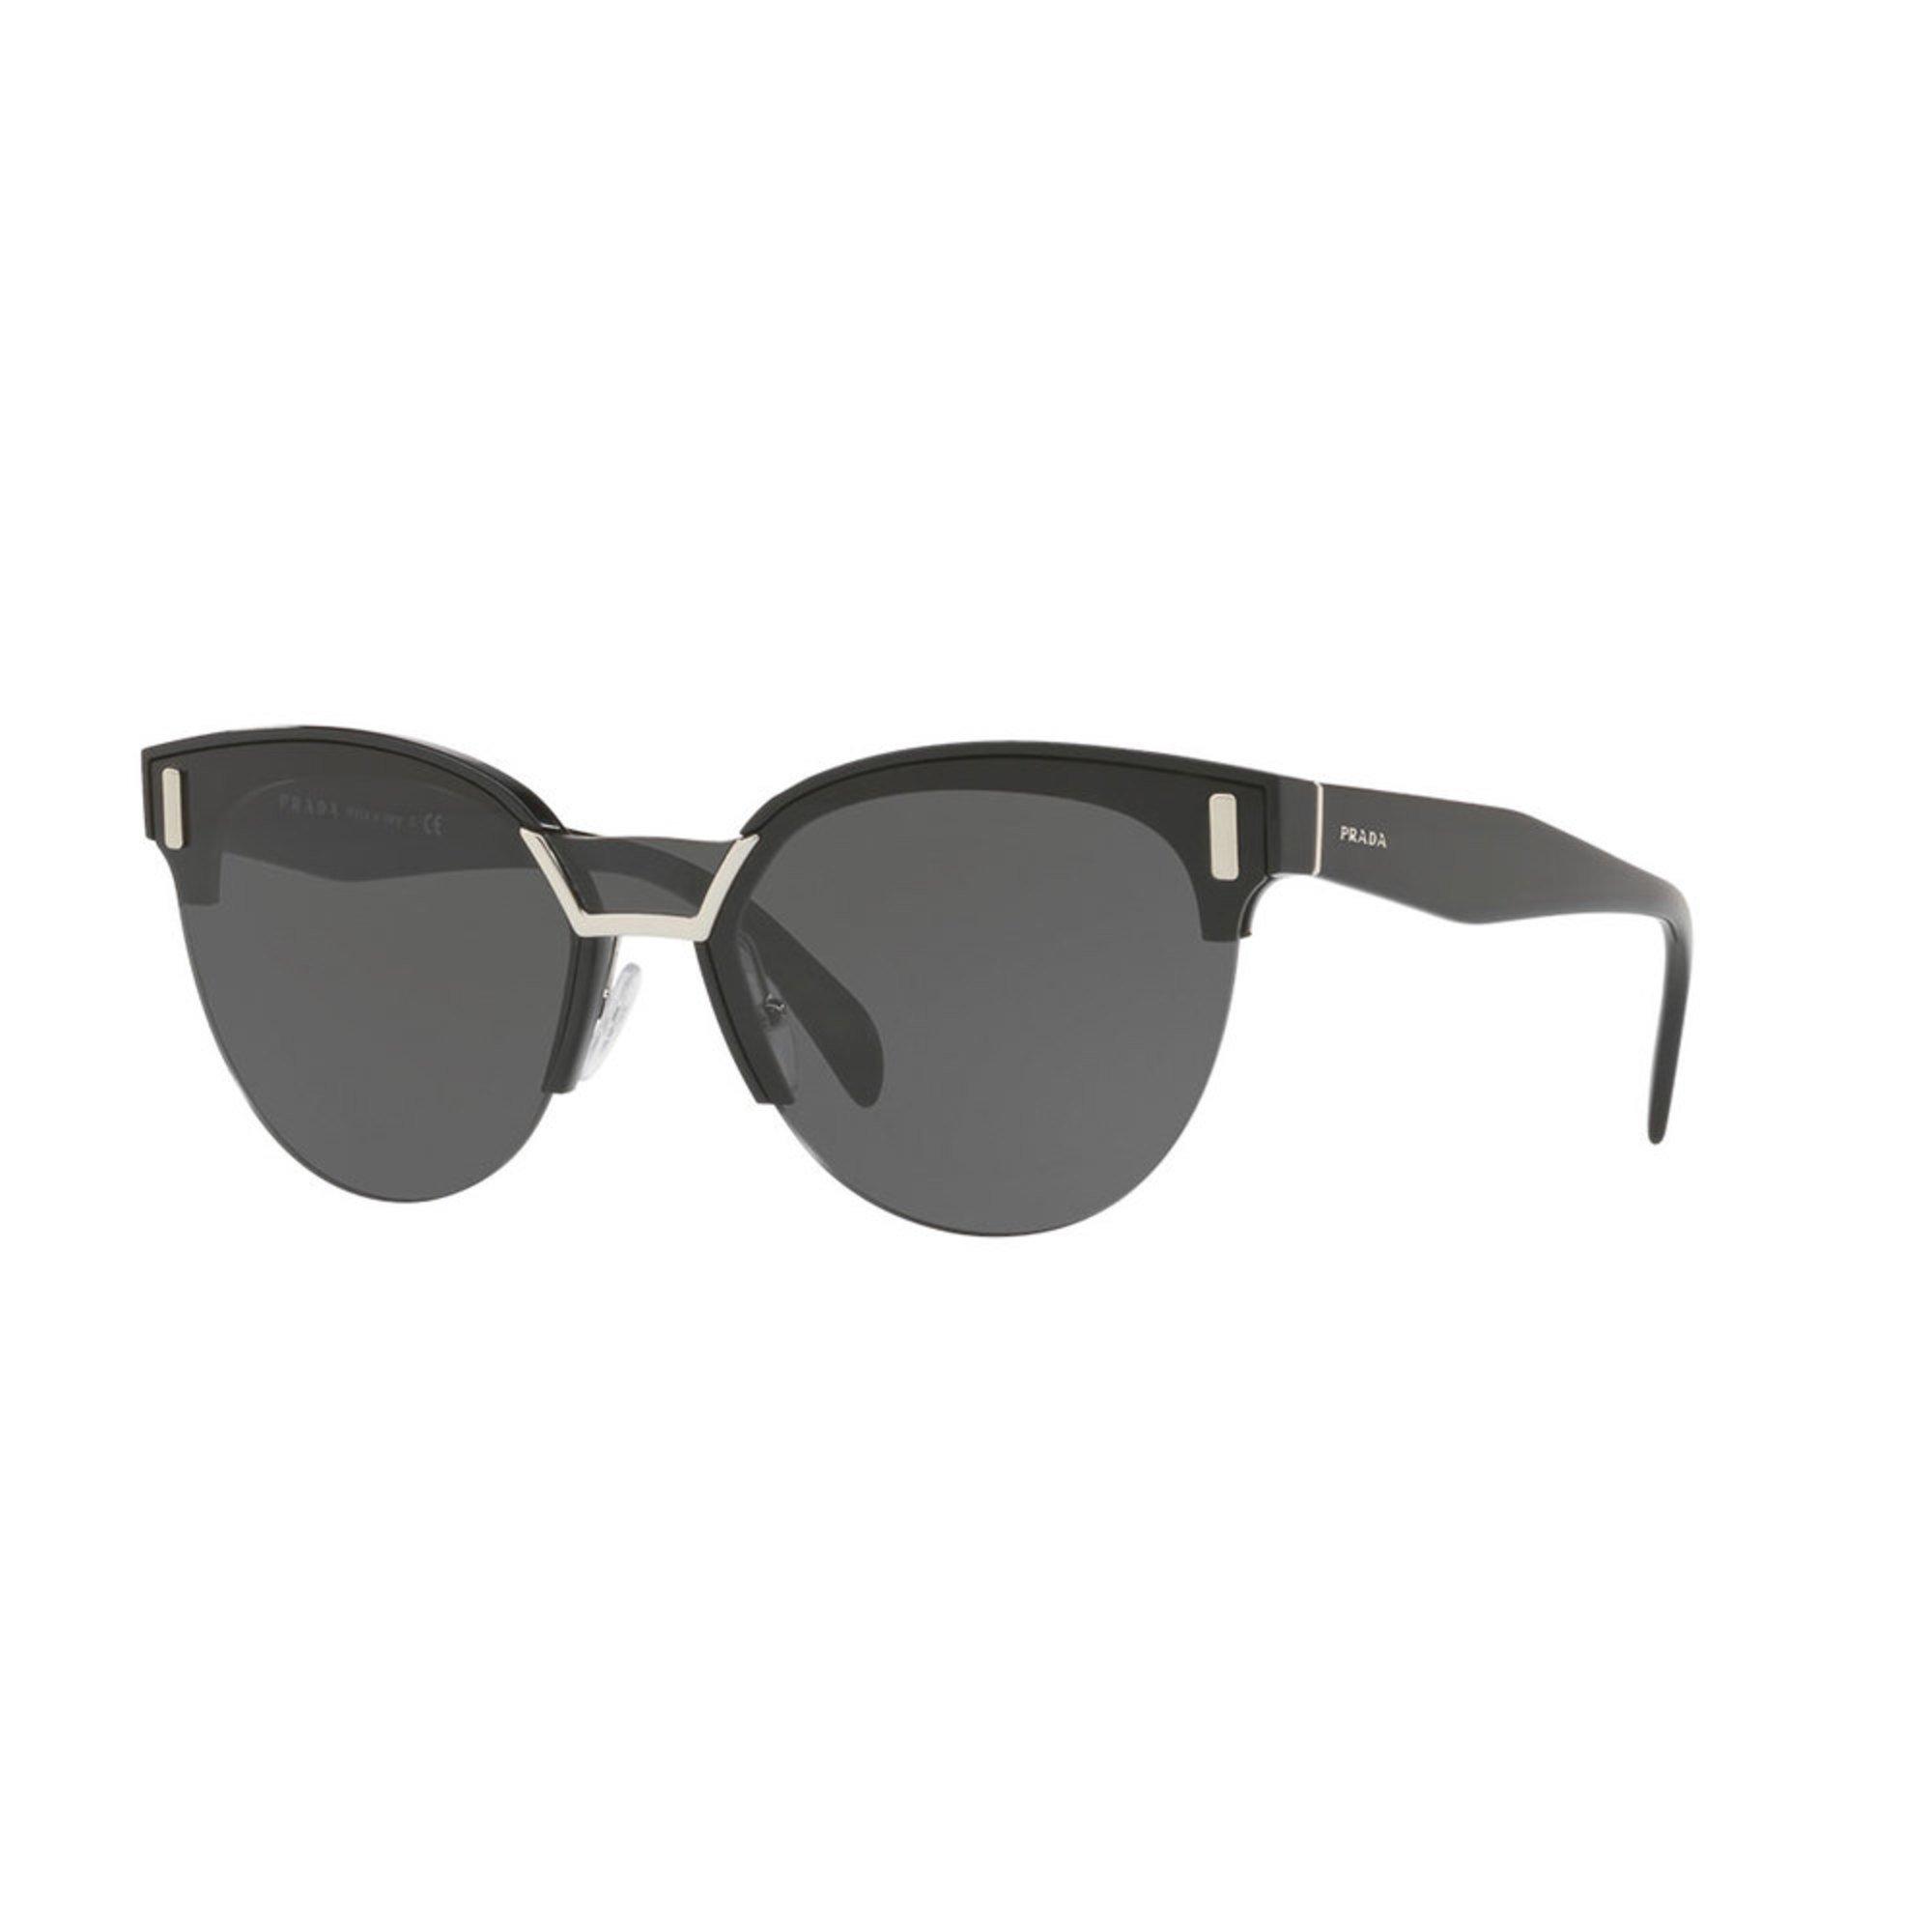 51119584bc978 Prada Women s Phantos Sunglasses